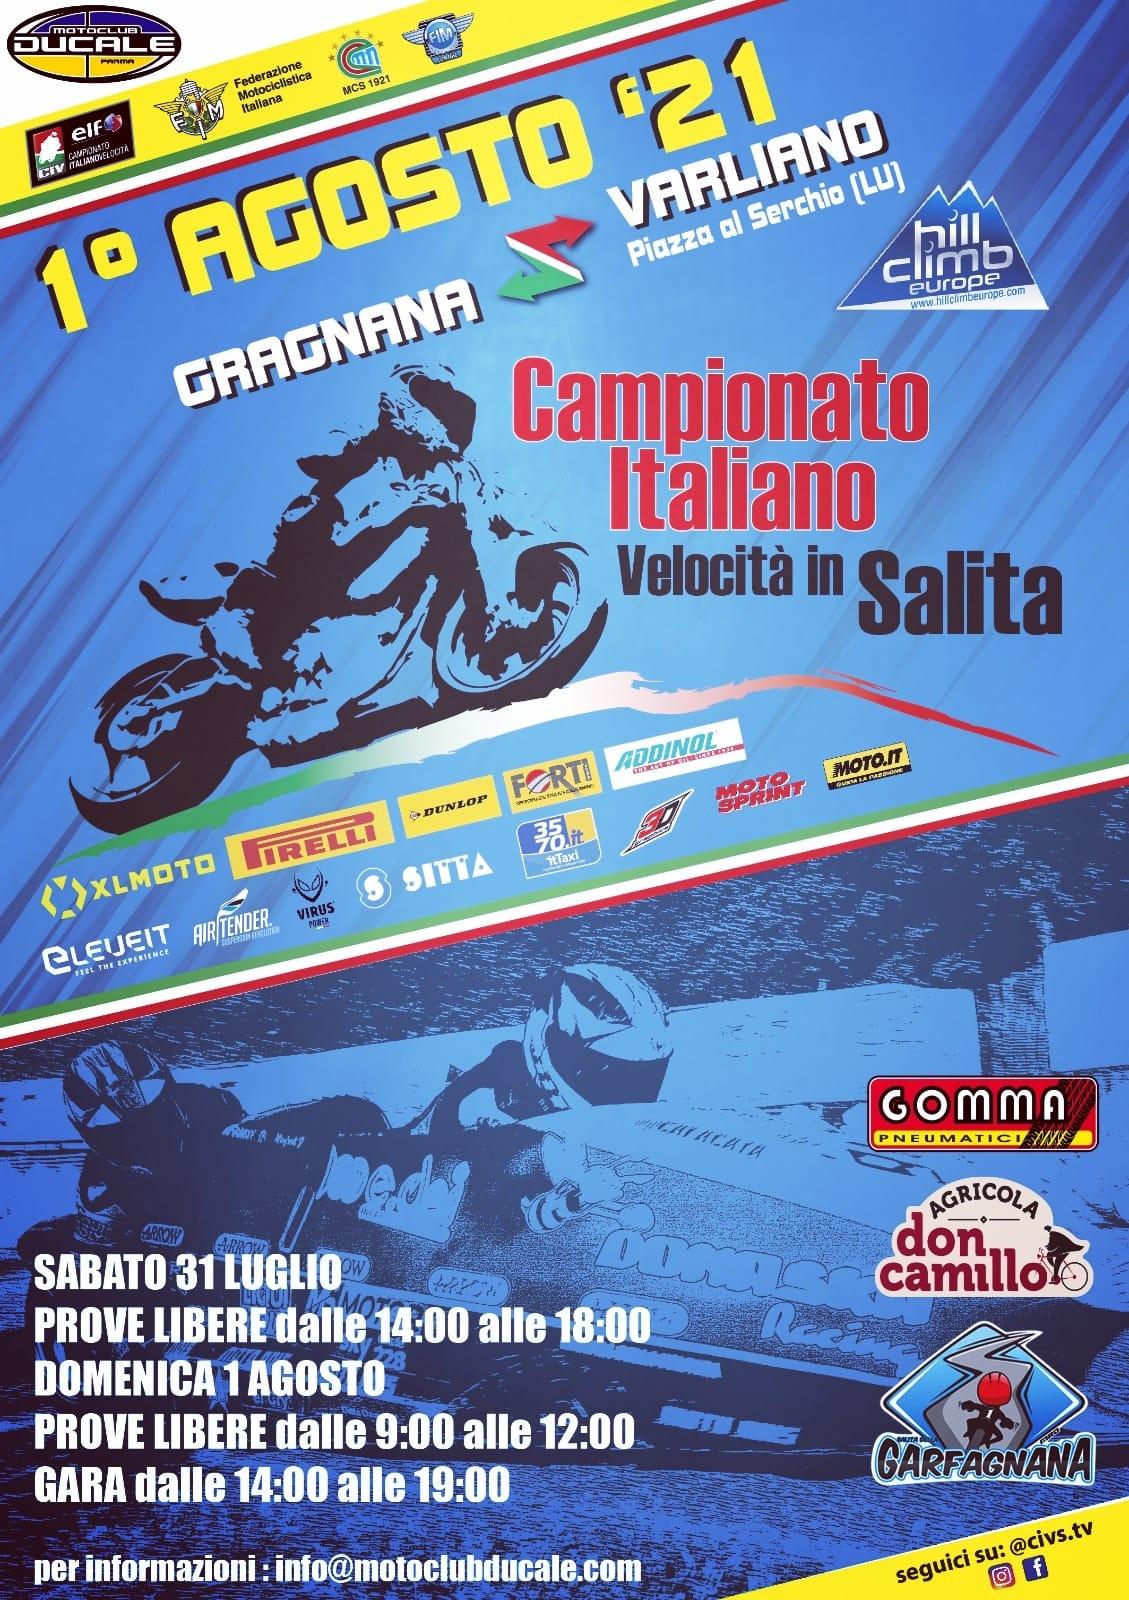 Garfagnana Manifesto Campionato in Salita 2021 ok